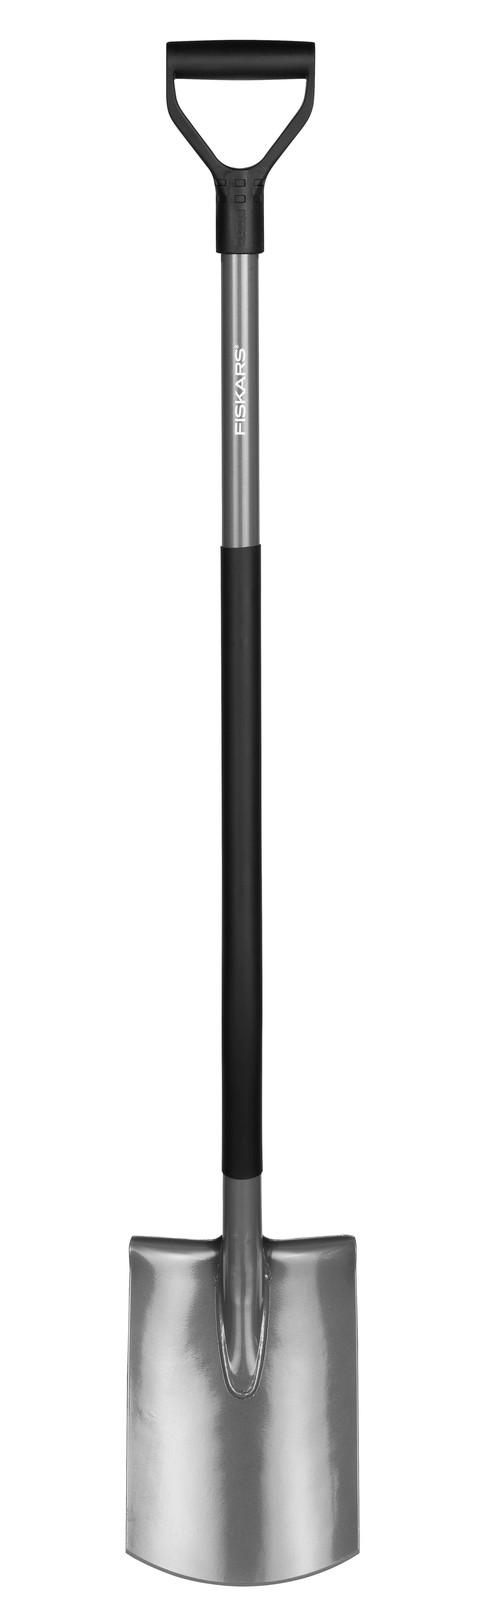 Fiskars Лопата прямая  с закругленным лезвием Ergonomic,  125 см, 2100г